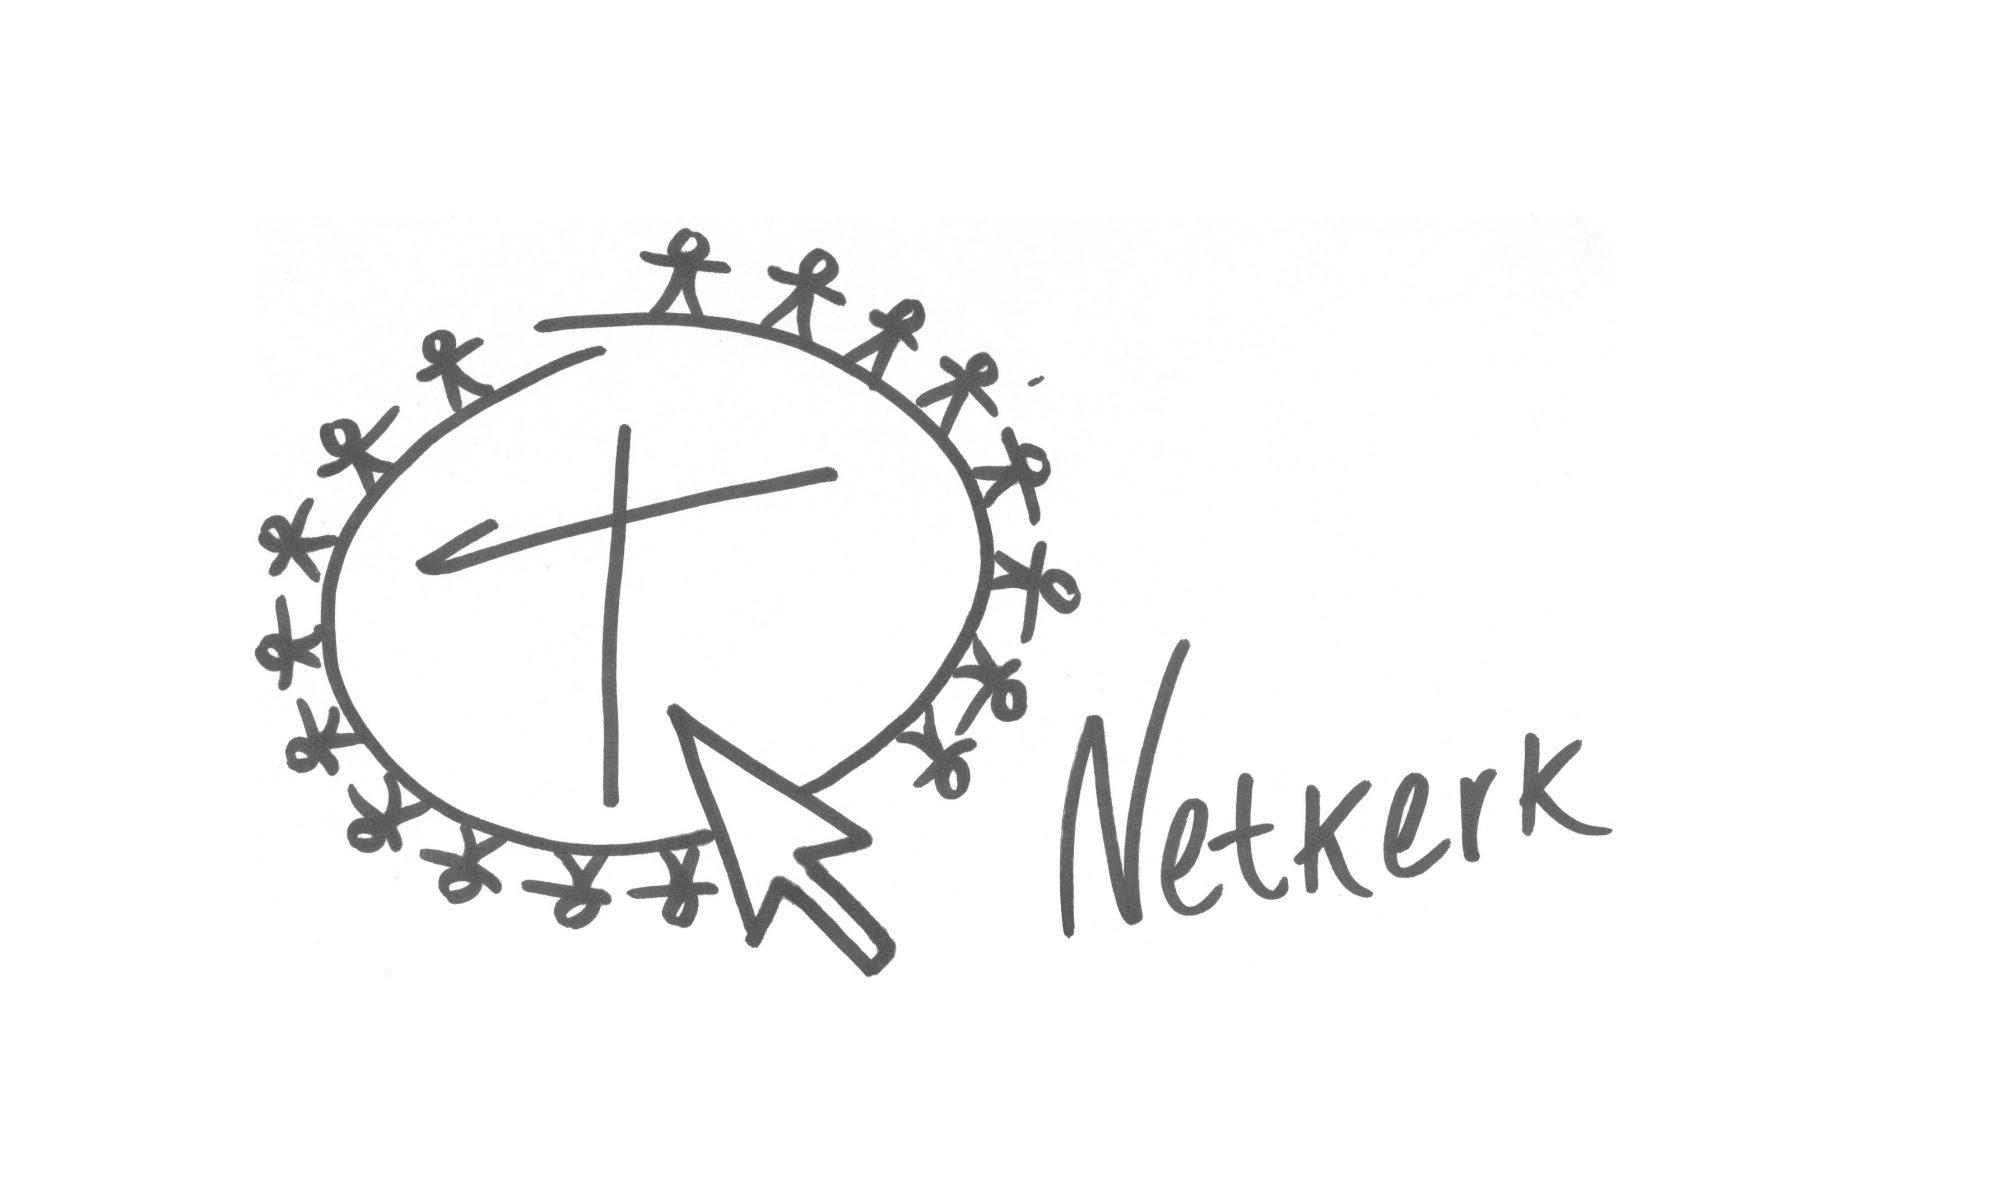 Netkerk